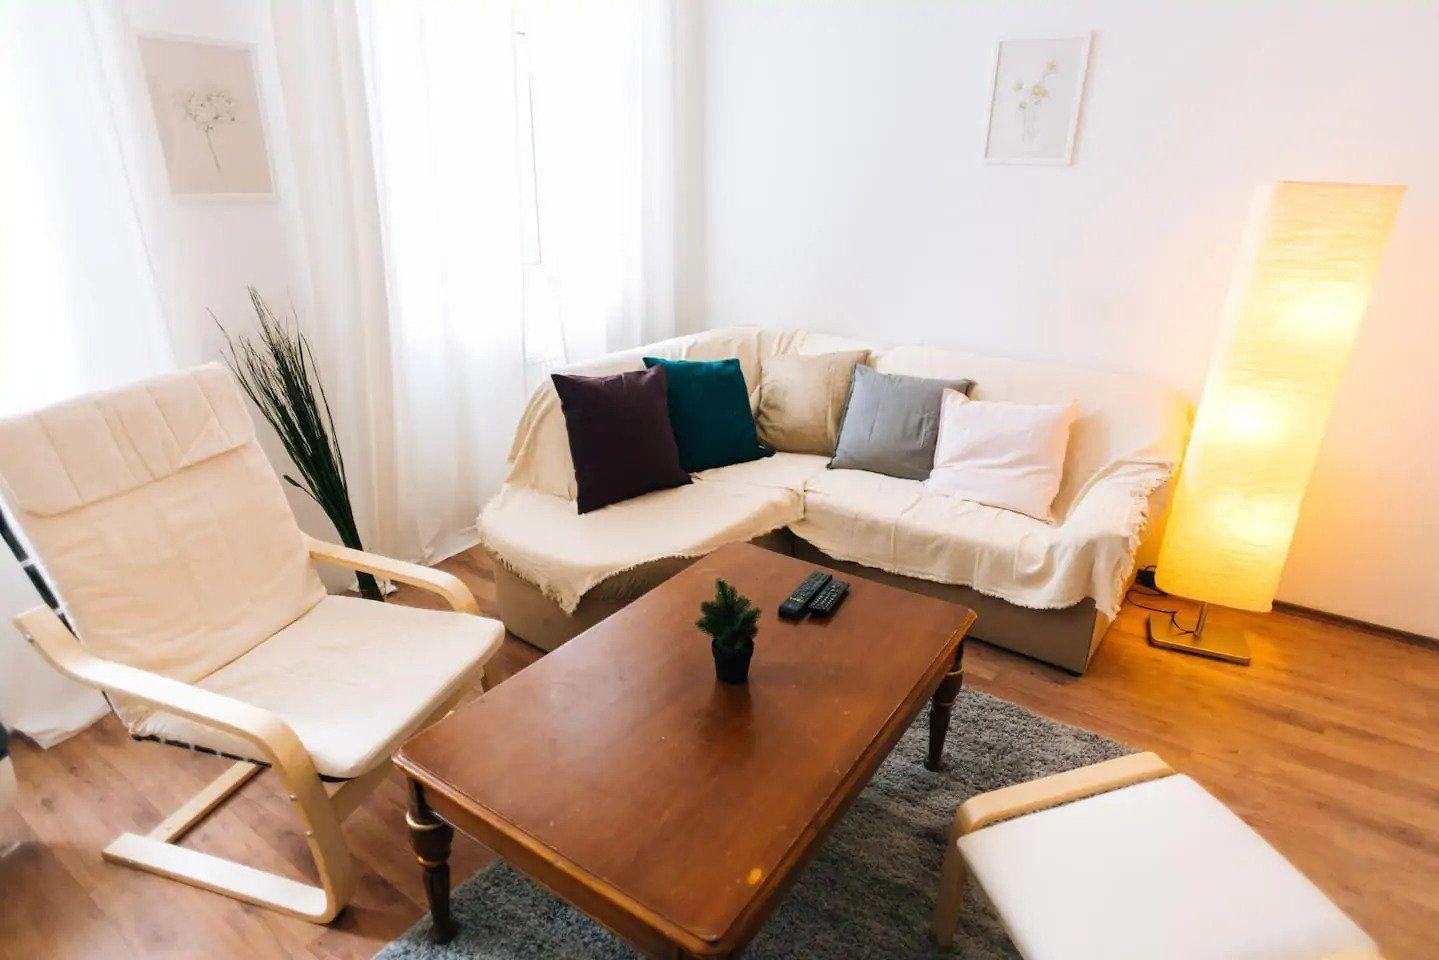 vienna accommodation prices